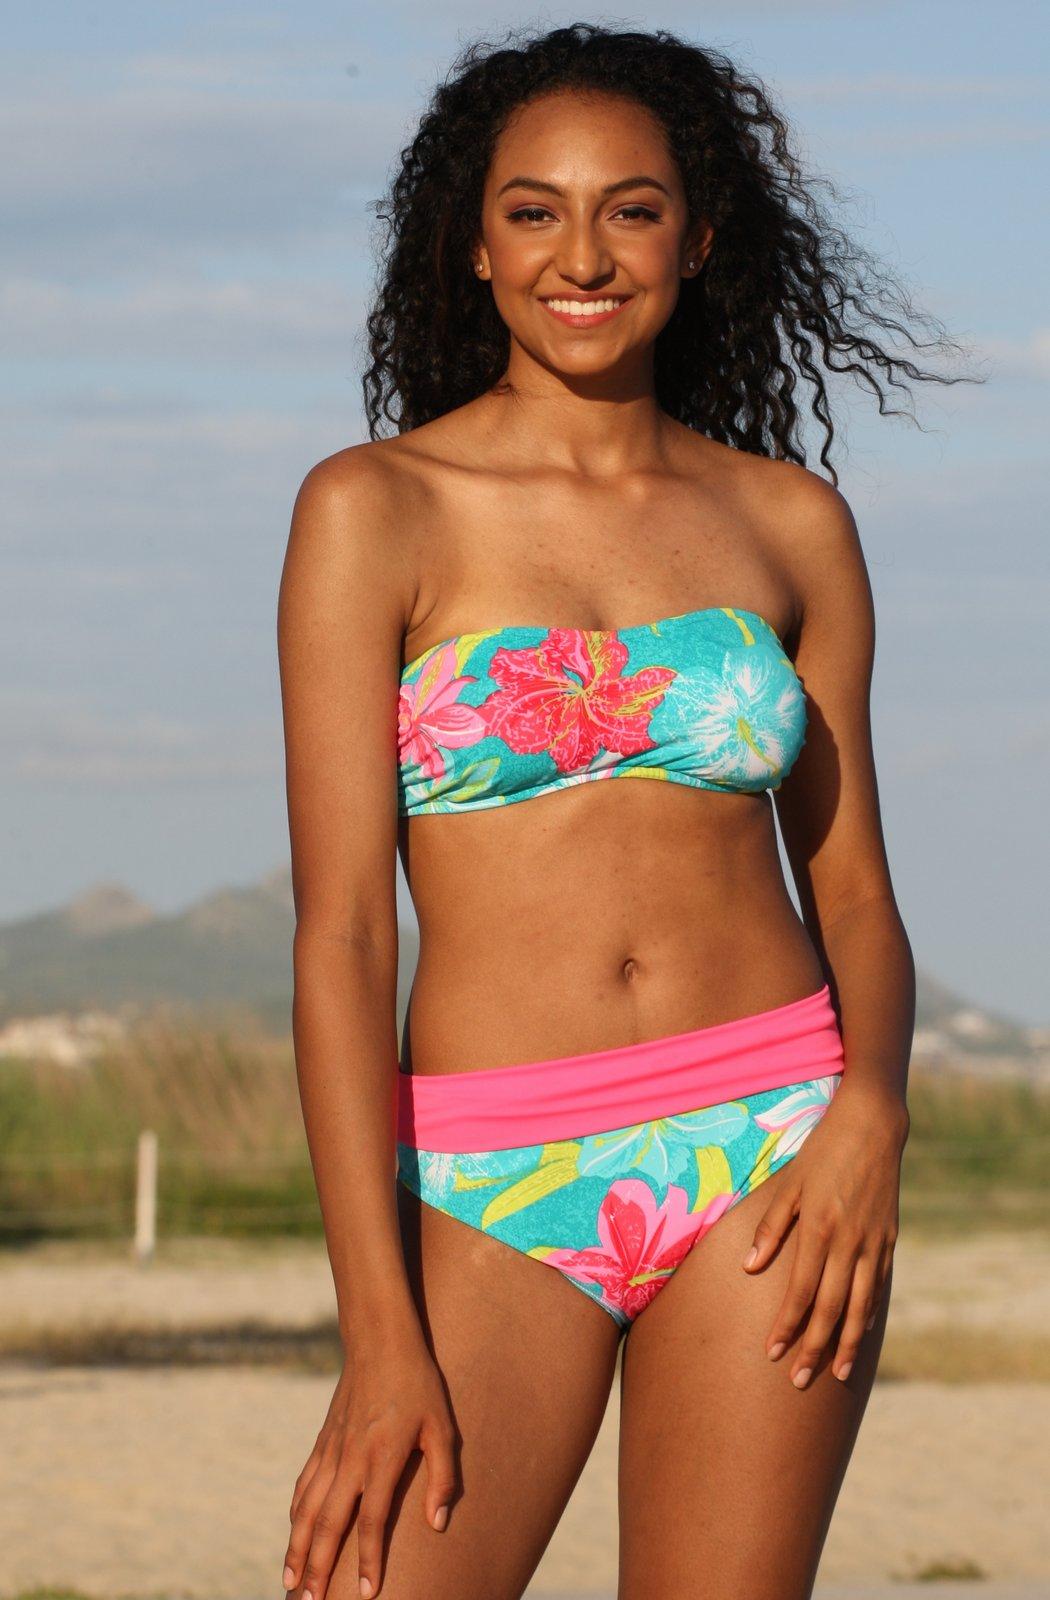 0bad3db5f67 Bikini News Daily - Ramona Singer share her diet and fitness secrets ...